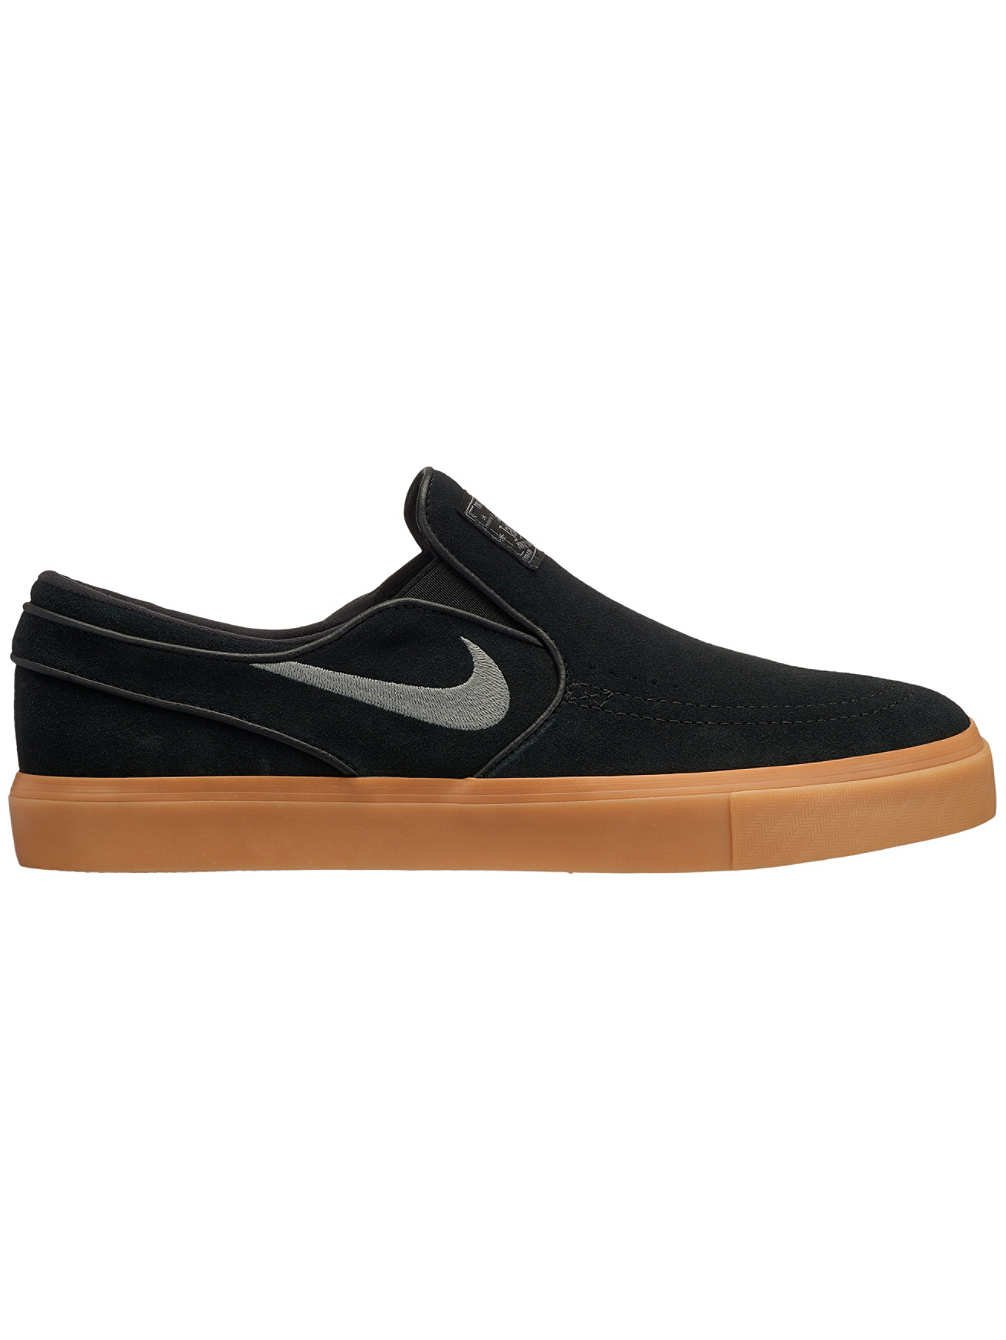 Nike Zoom Stefan Janoski Slip, Zapatillas de Deporte para Hombre 45.5 EU|Multicolor (Black/Gunsmoke/Gum Light Brown 005)